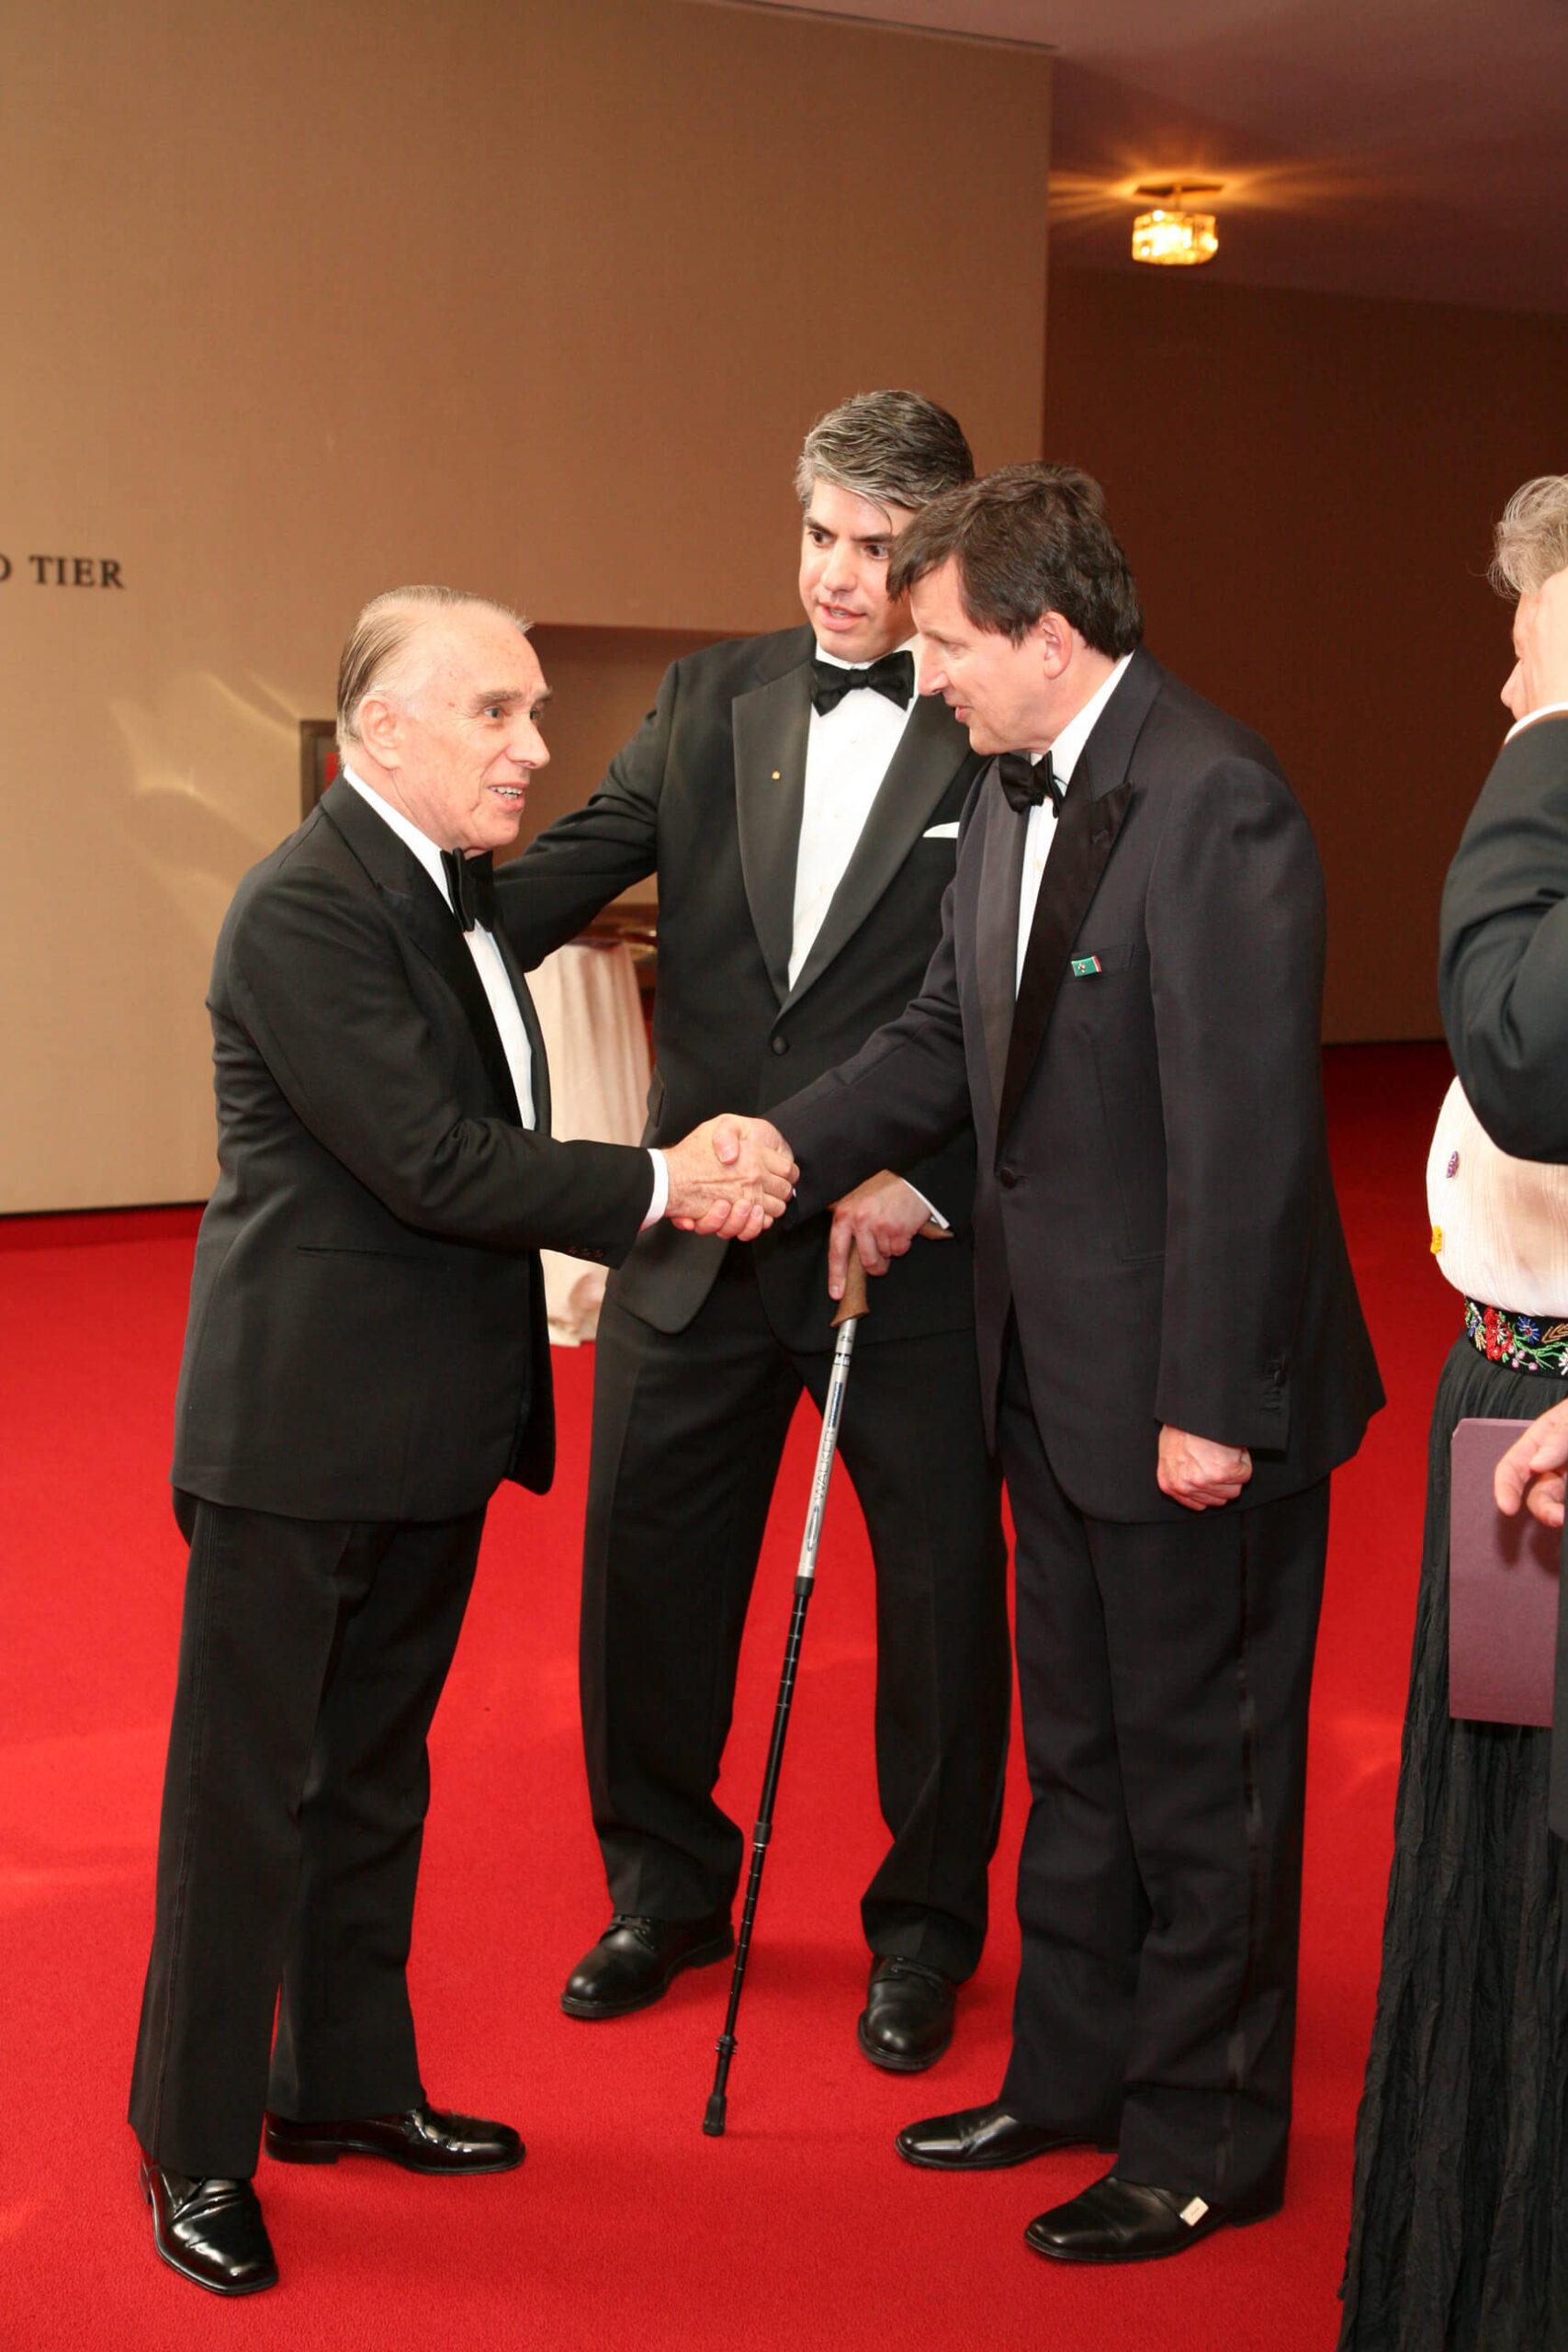 Mr. Julius Varallyay Board Member, Mr. Maximilian Teleki, and Dr. Charles Simonyi